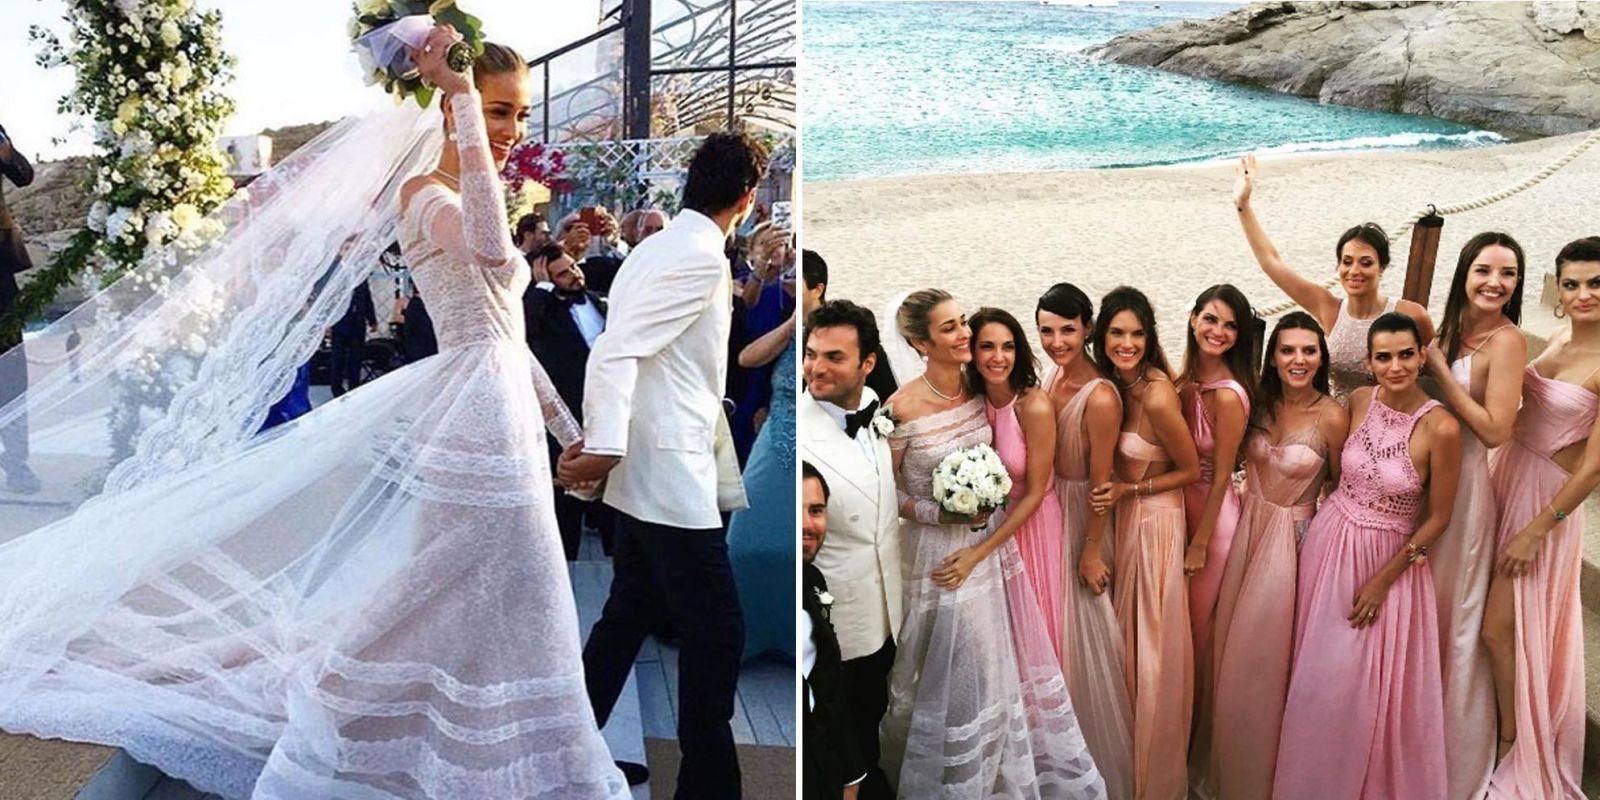 ana beatriz barros married